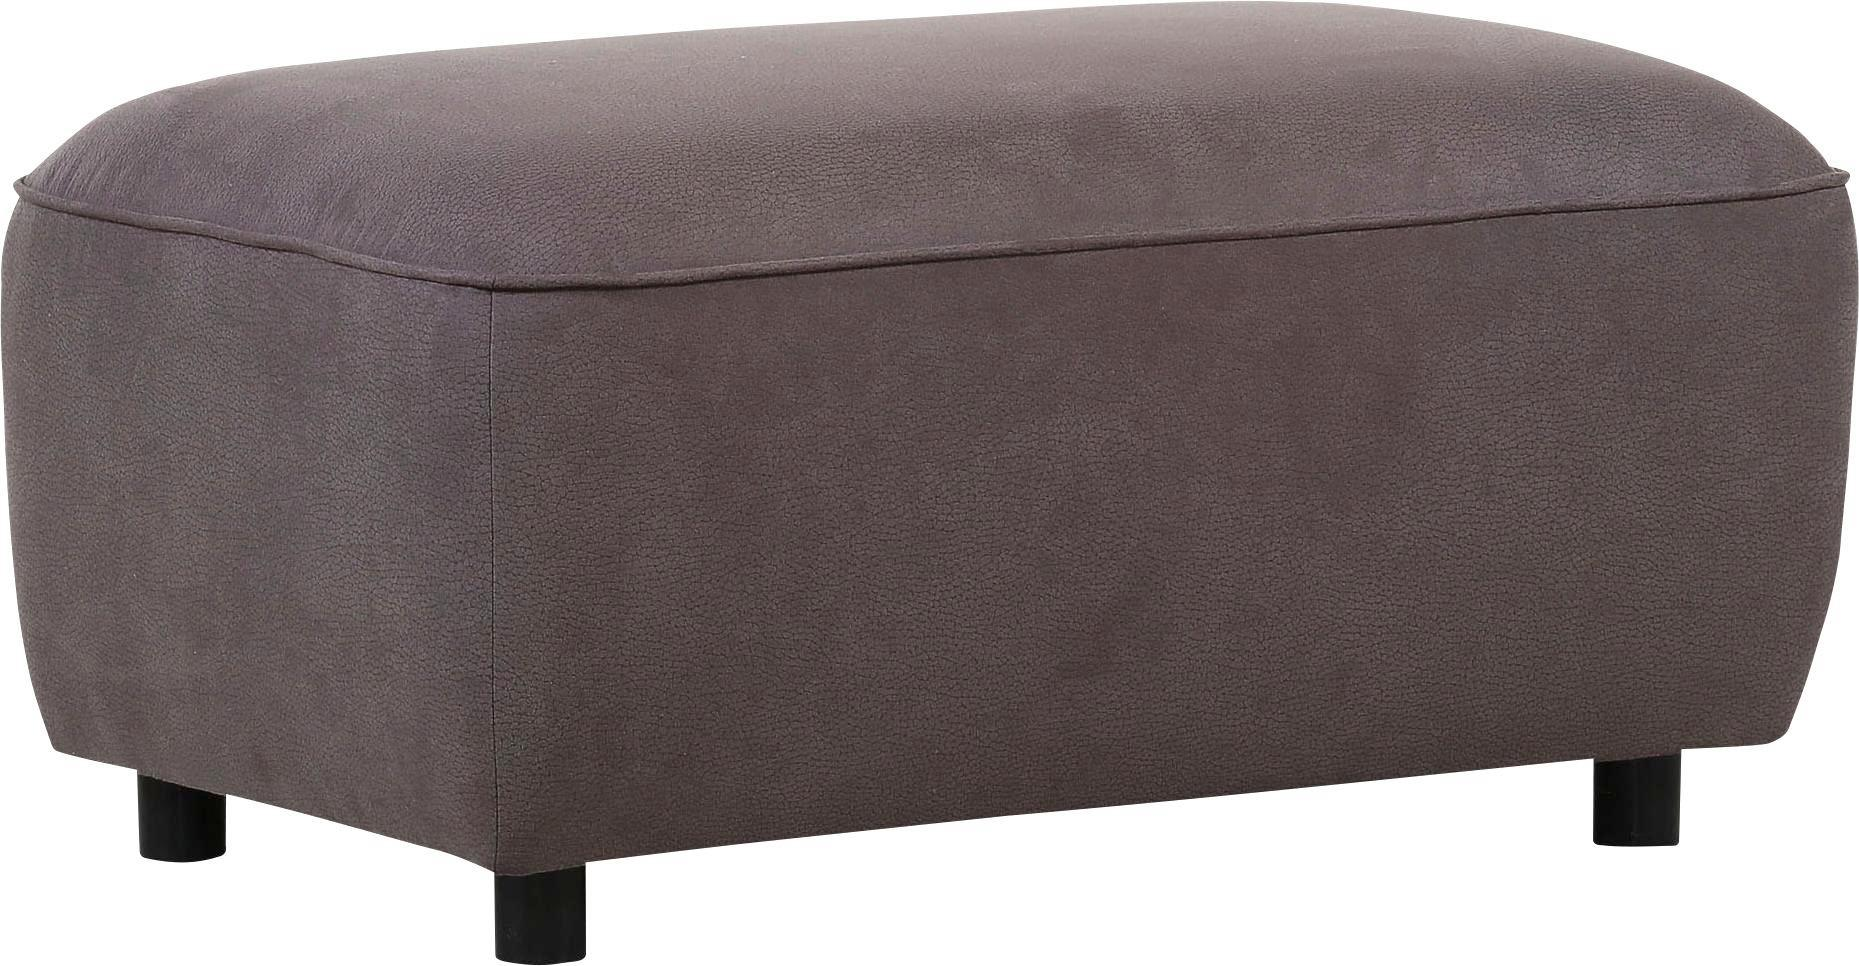 Tabure Porto - temno rjava, Moderno, tekstil (88/45/56cm) - MÖMAX modern living